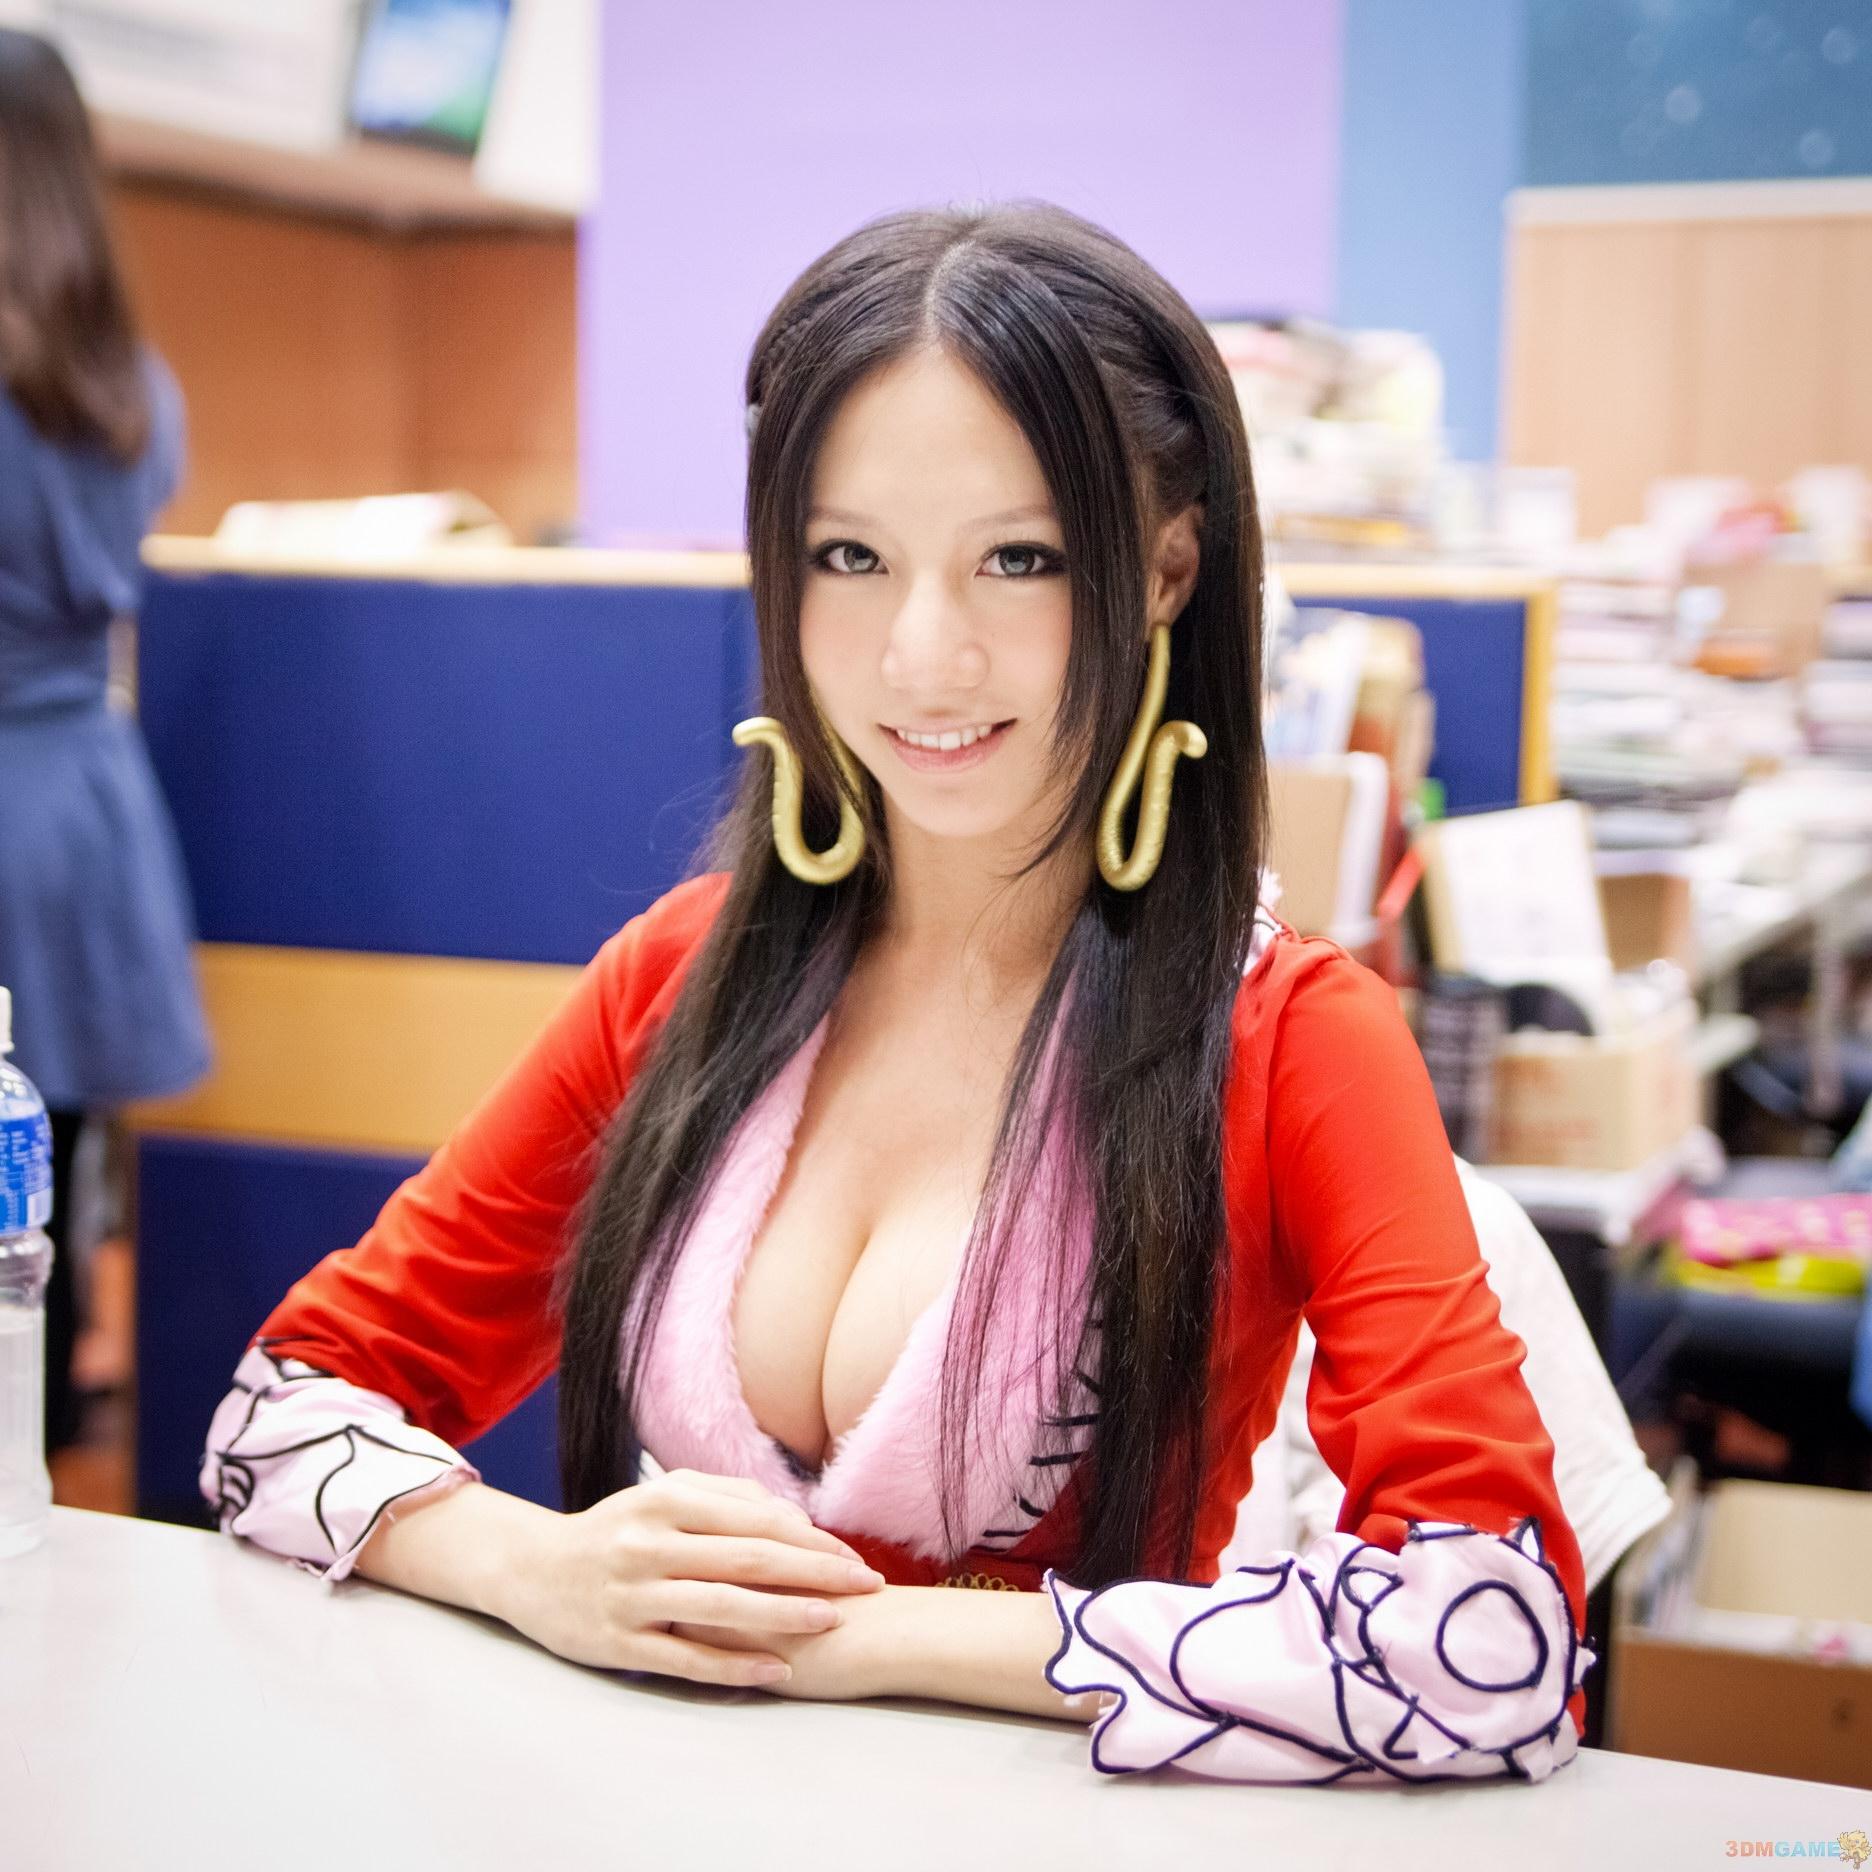 d奶蛇姬林采缇自称不想大红大紫 女帝cos回顾图片